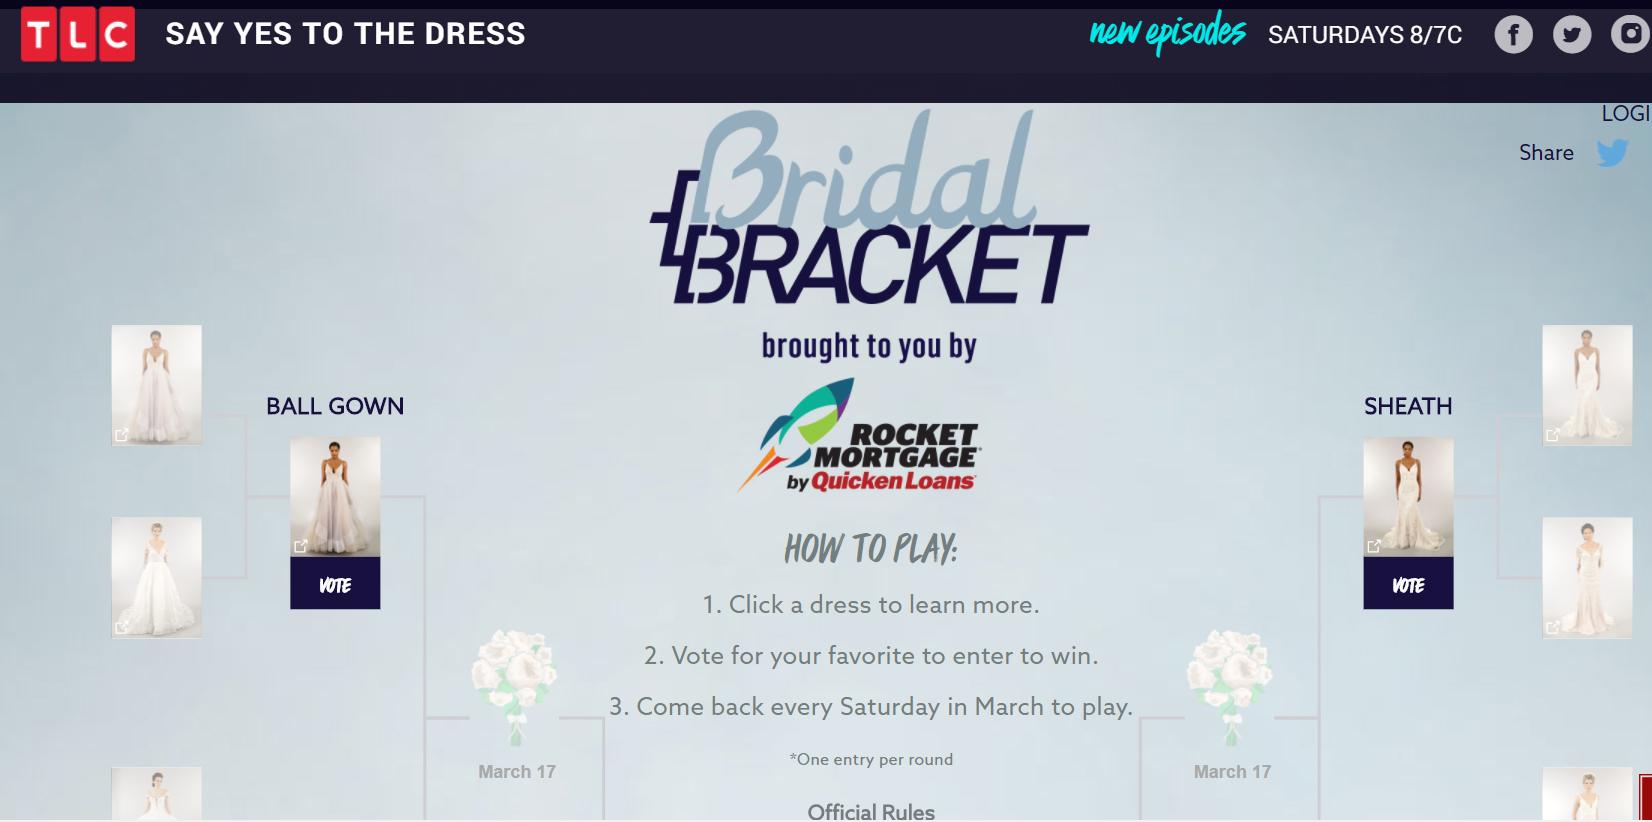 tlc-bridal-brackets